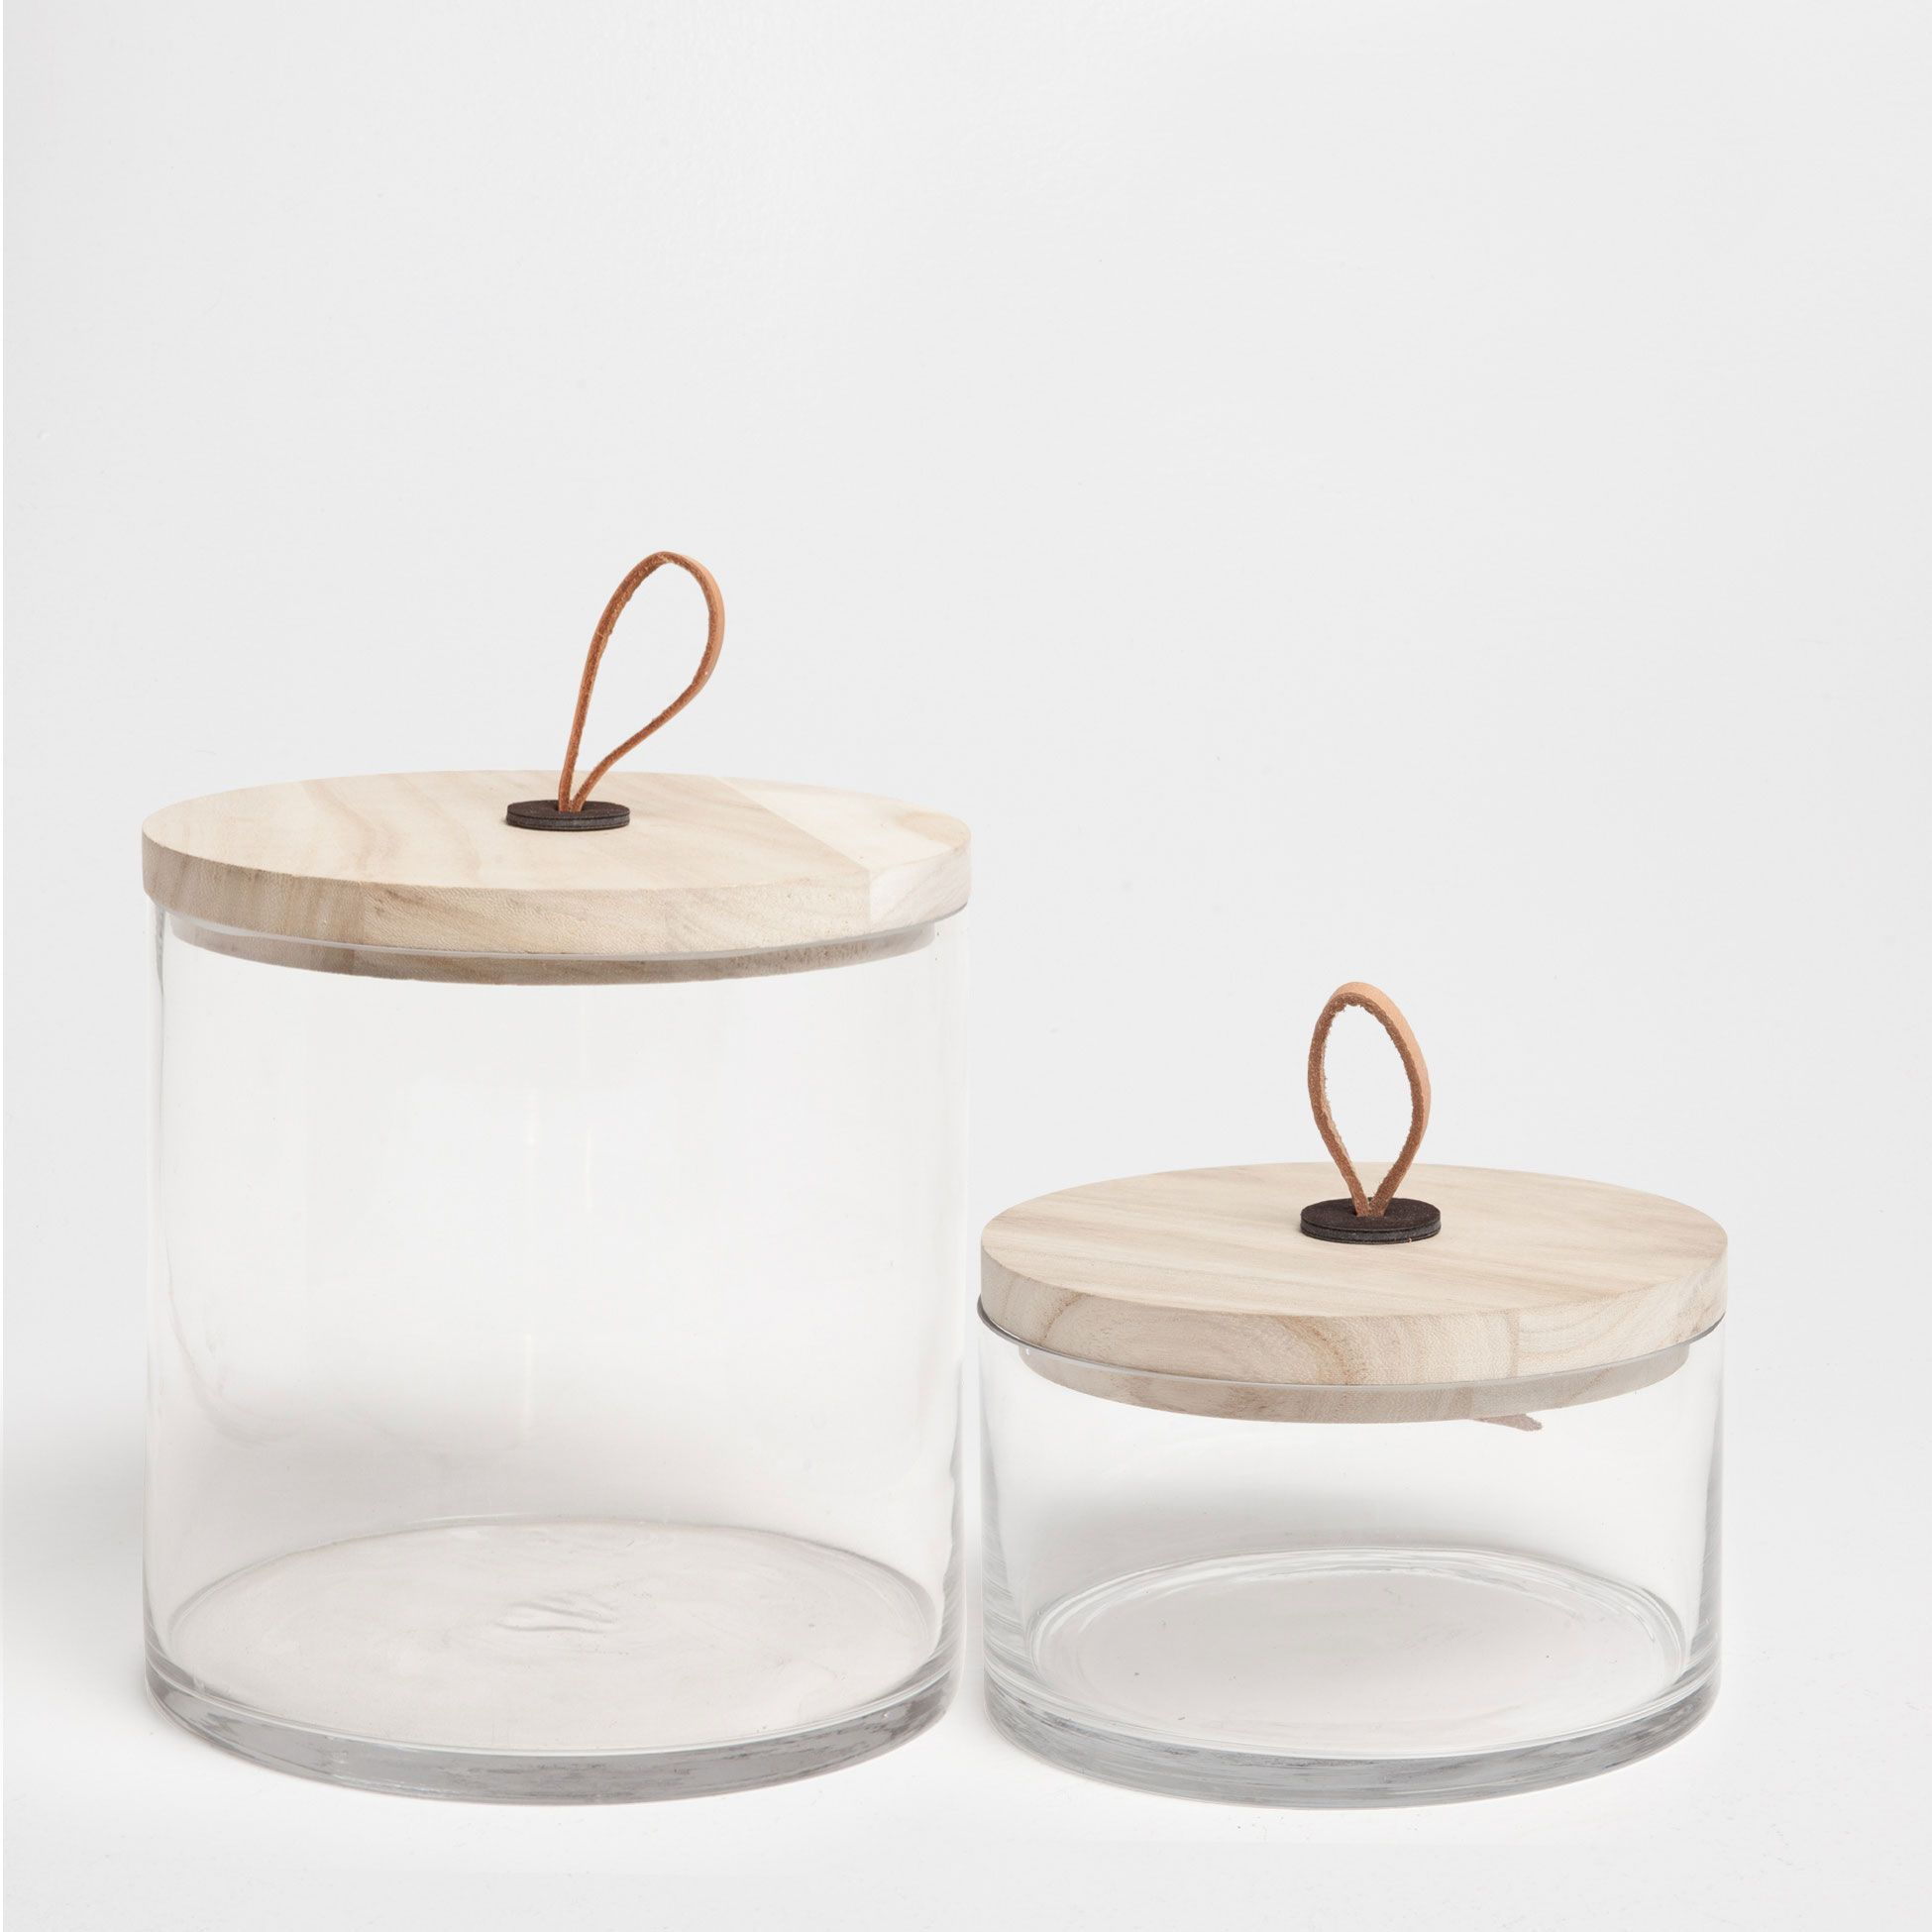 Glass Jar With Wooden Handles: Zara Home UK